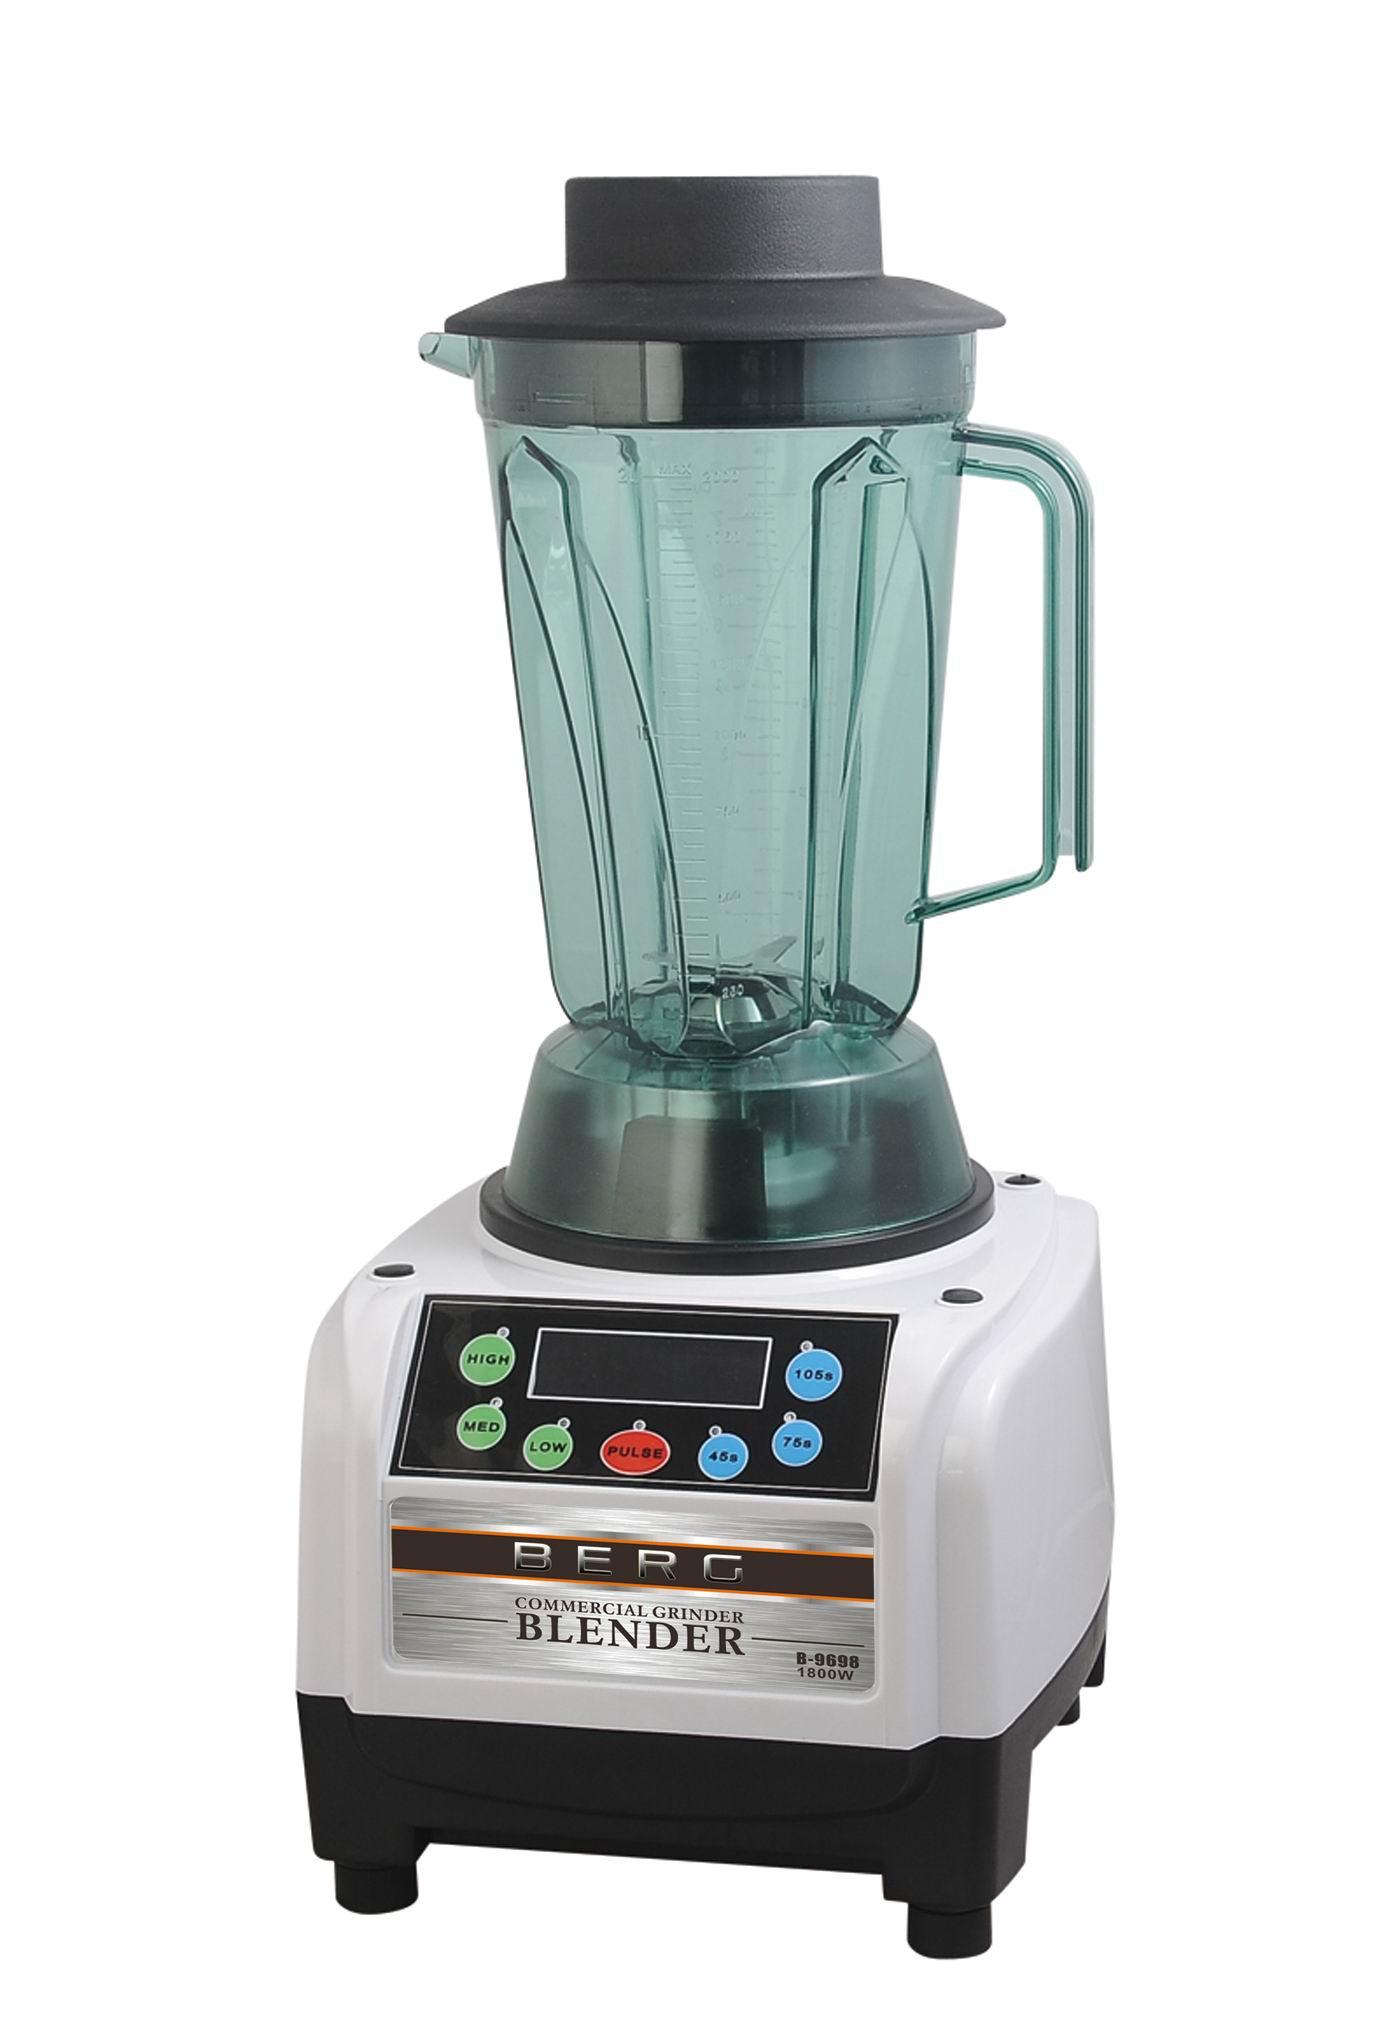 Berg J100 Pro Slow Juicer Review : BERG 1800W 2.5HP SMART COMMERCIAL FOOD BLENDER SMOOTHIE MAKER ICE CRUSHER